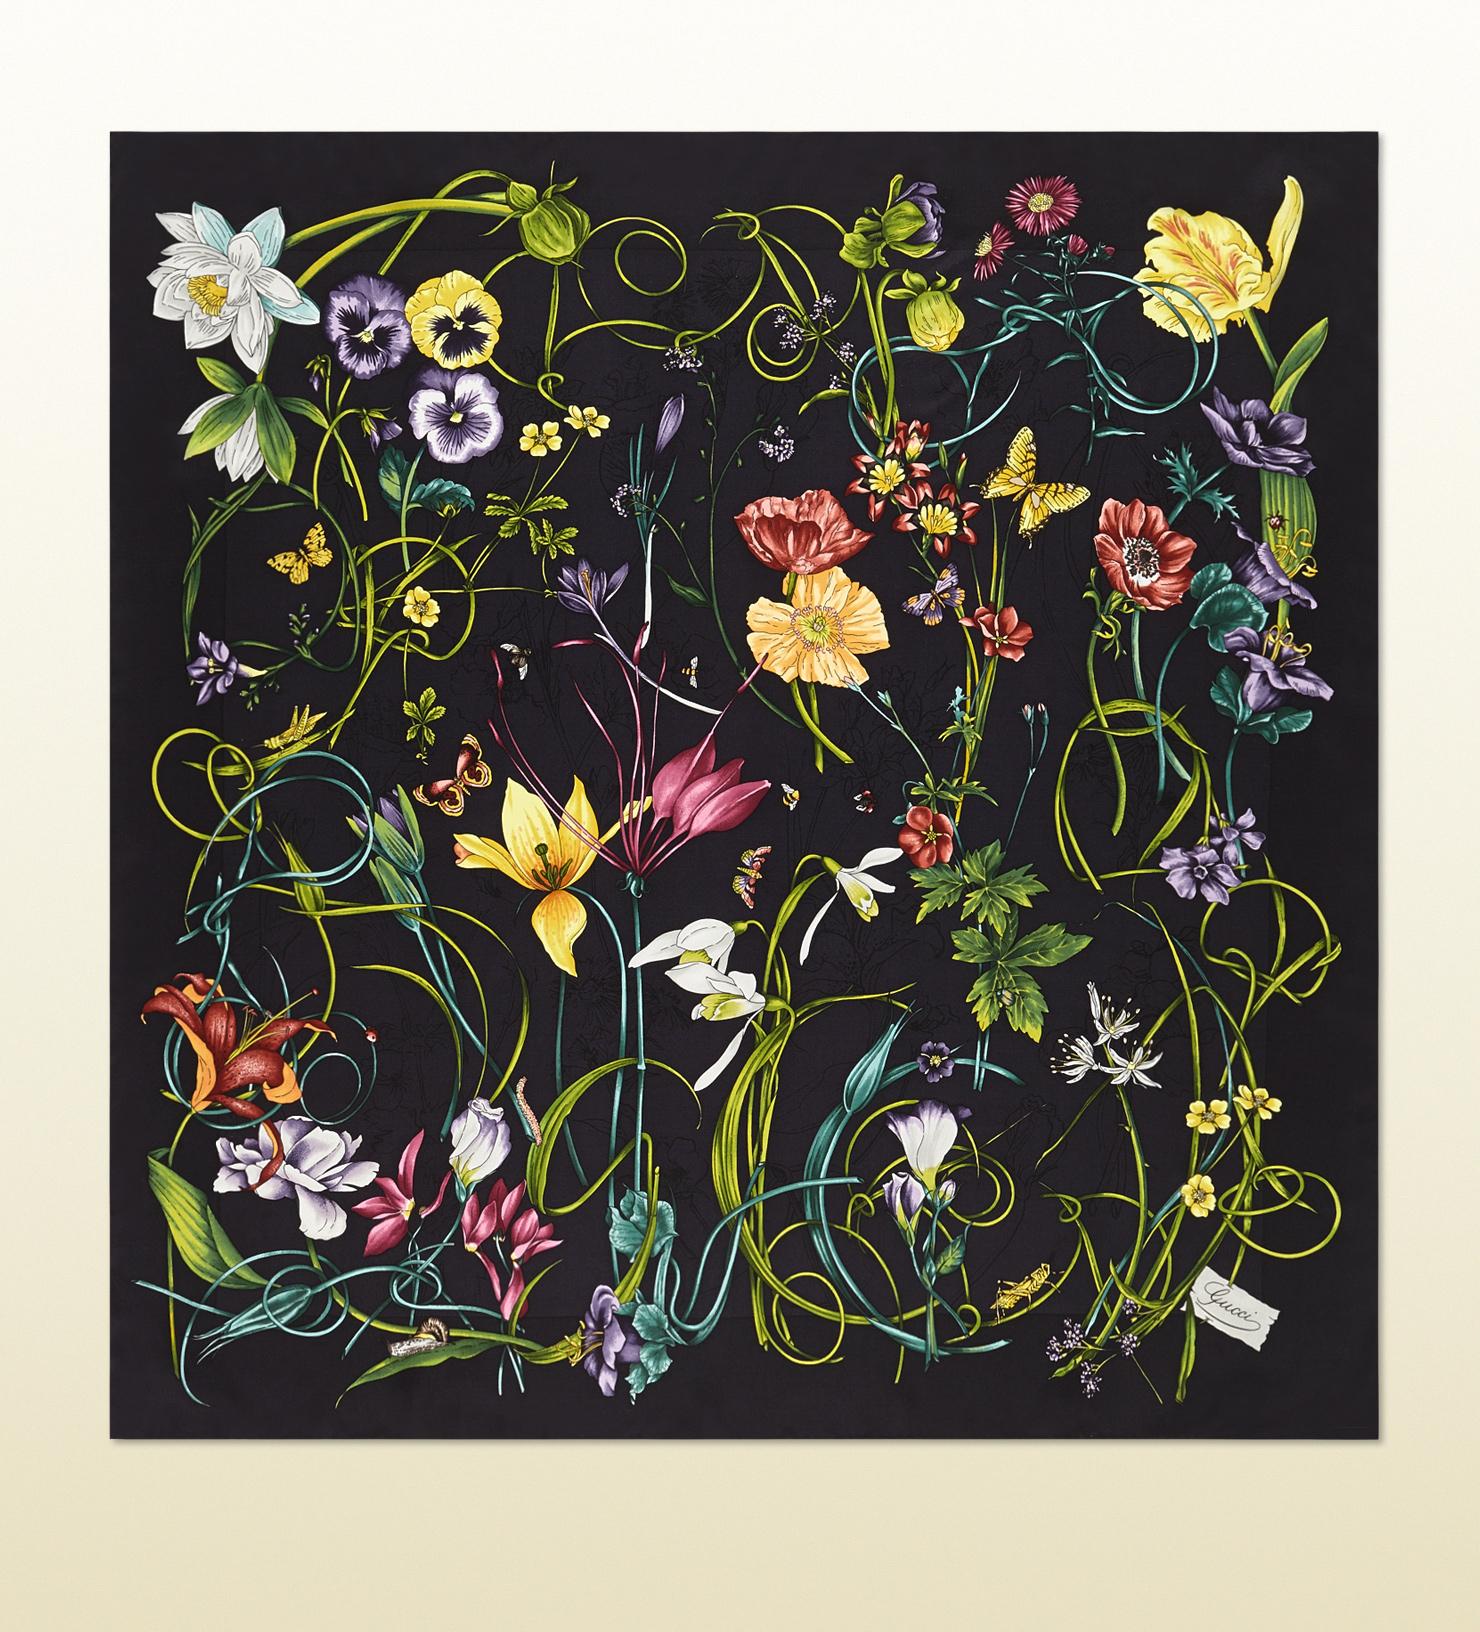 gucci flora infinity print silk foulard in black for men